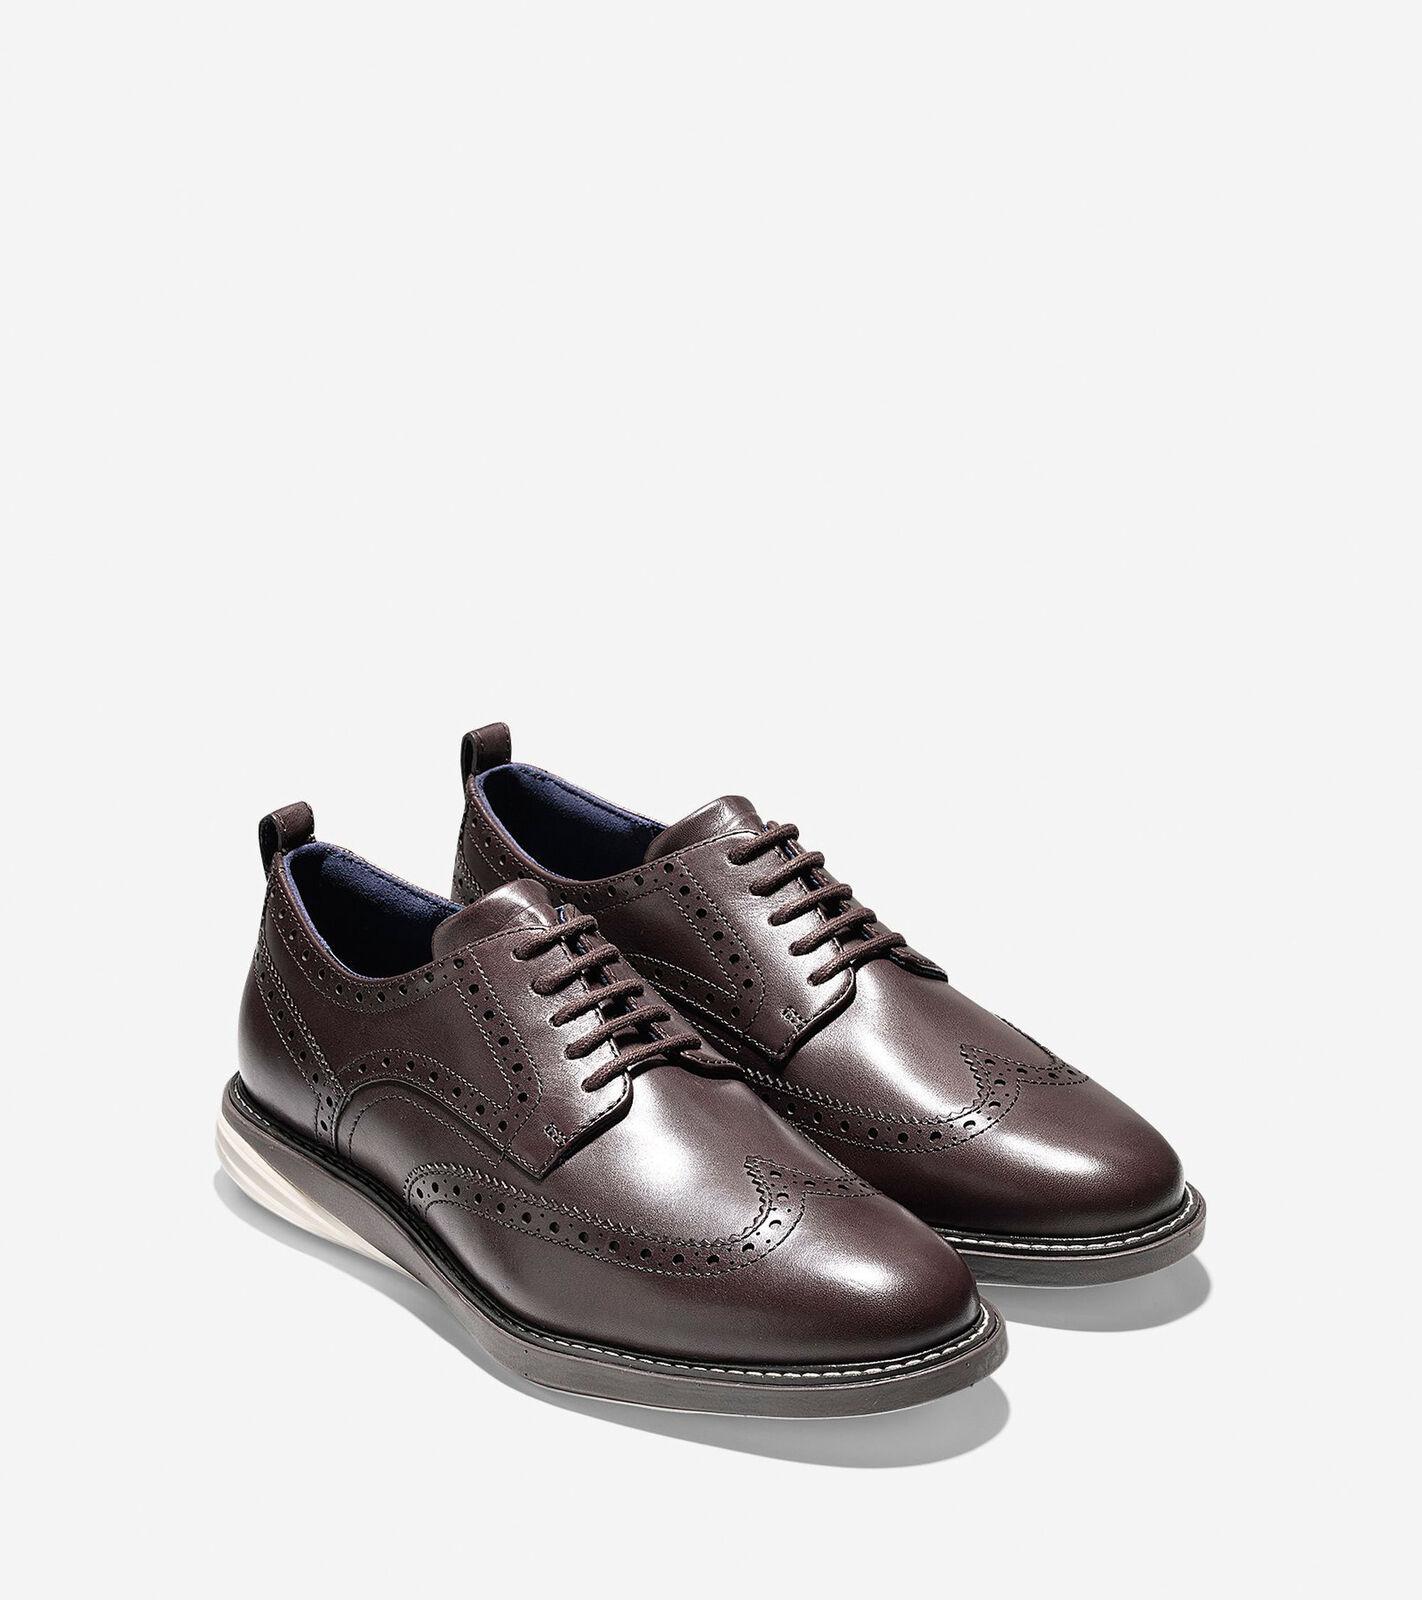 Scarpe casual da uomo  COLE HAAN Grand Evolution Brown Leather Wingtip Oxford Shoes